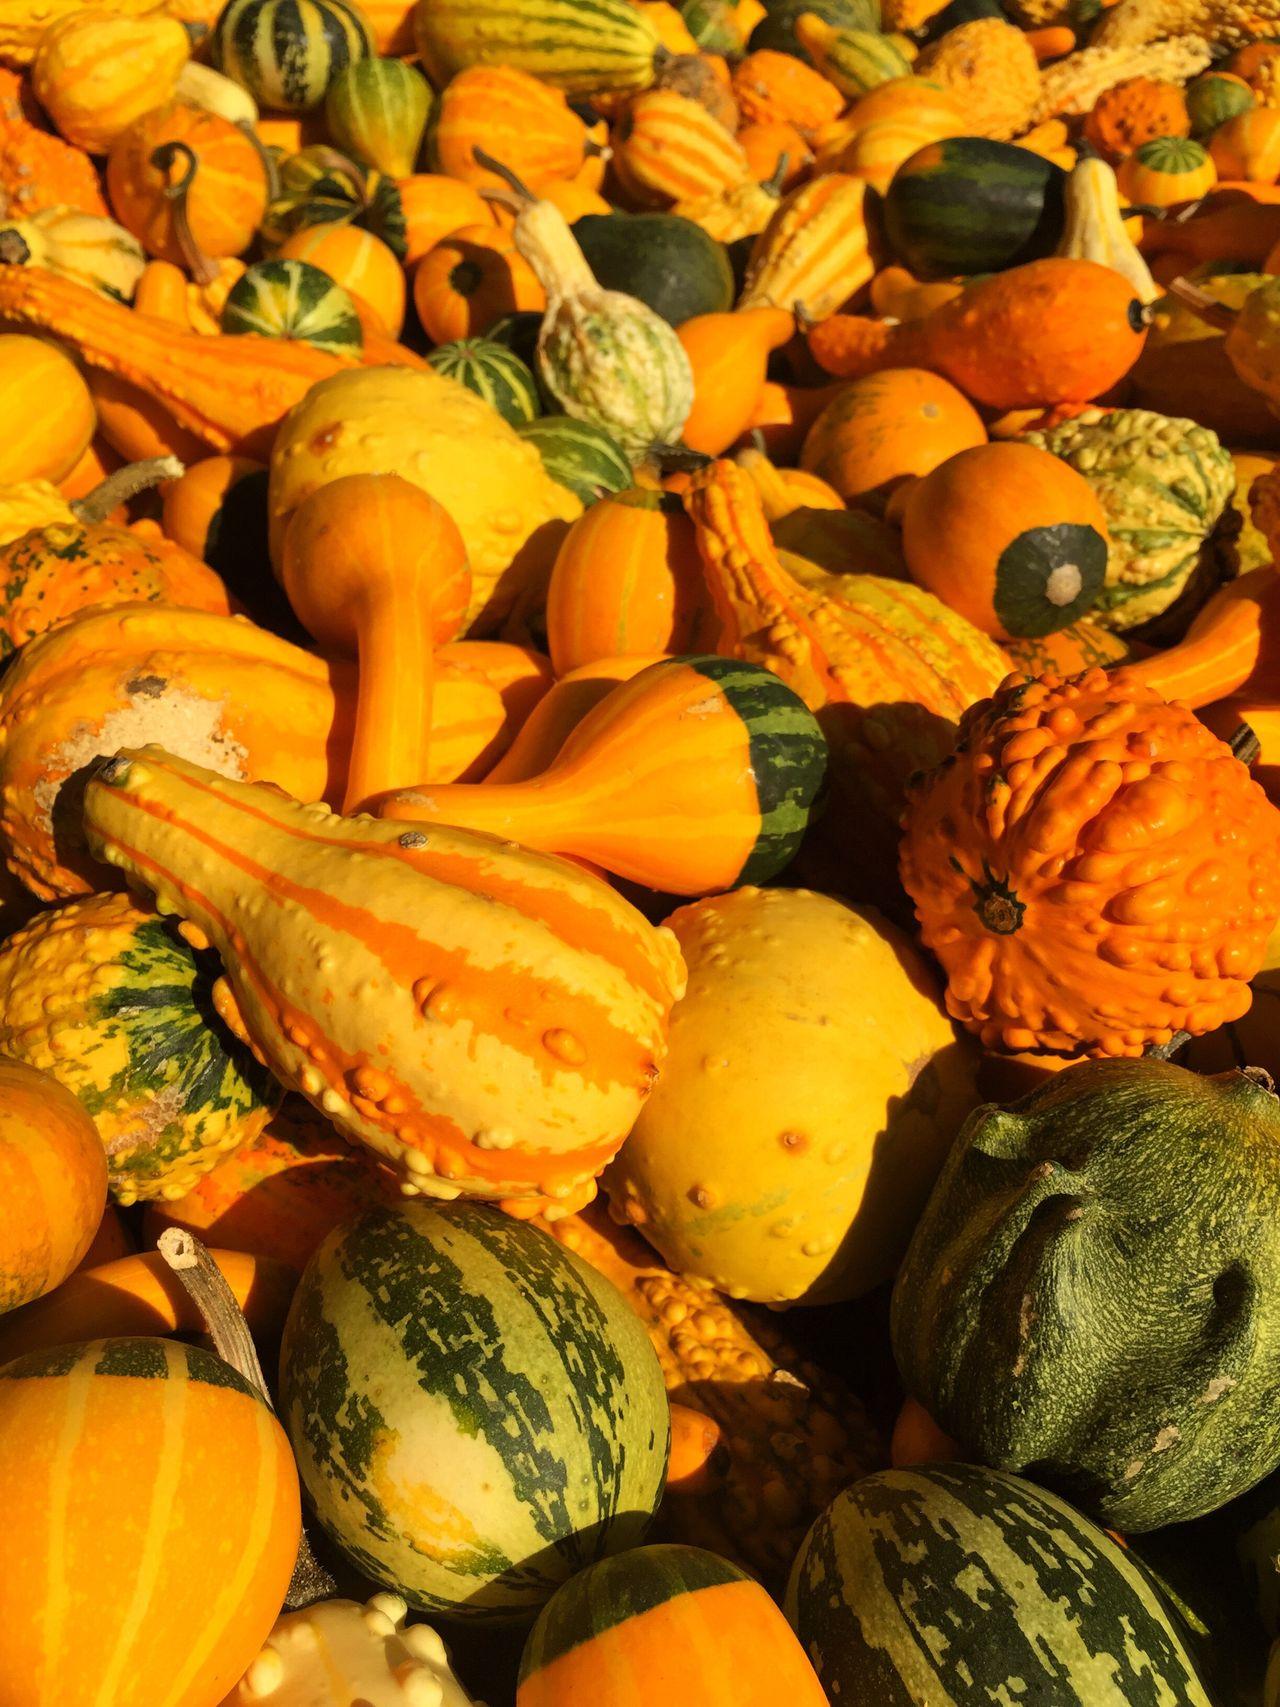 Pumpkins Autumn Herbst Pumpkin Orange Colours Colours Of Nature Yellow Green Farm Farmers Market Produce Farming Growing Vegetables Veg Assortment Heritage Veg Stripes Pattern Stripe Gourd Squash Courgette Nobbly Haloween